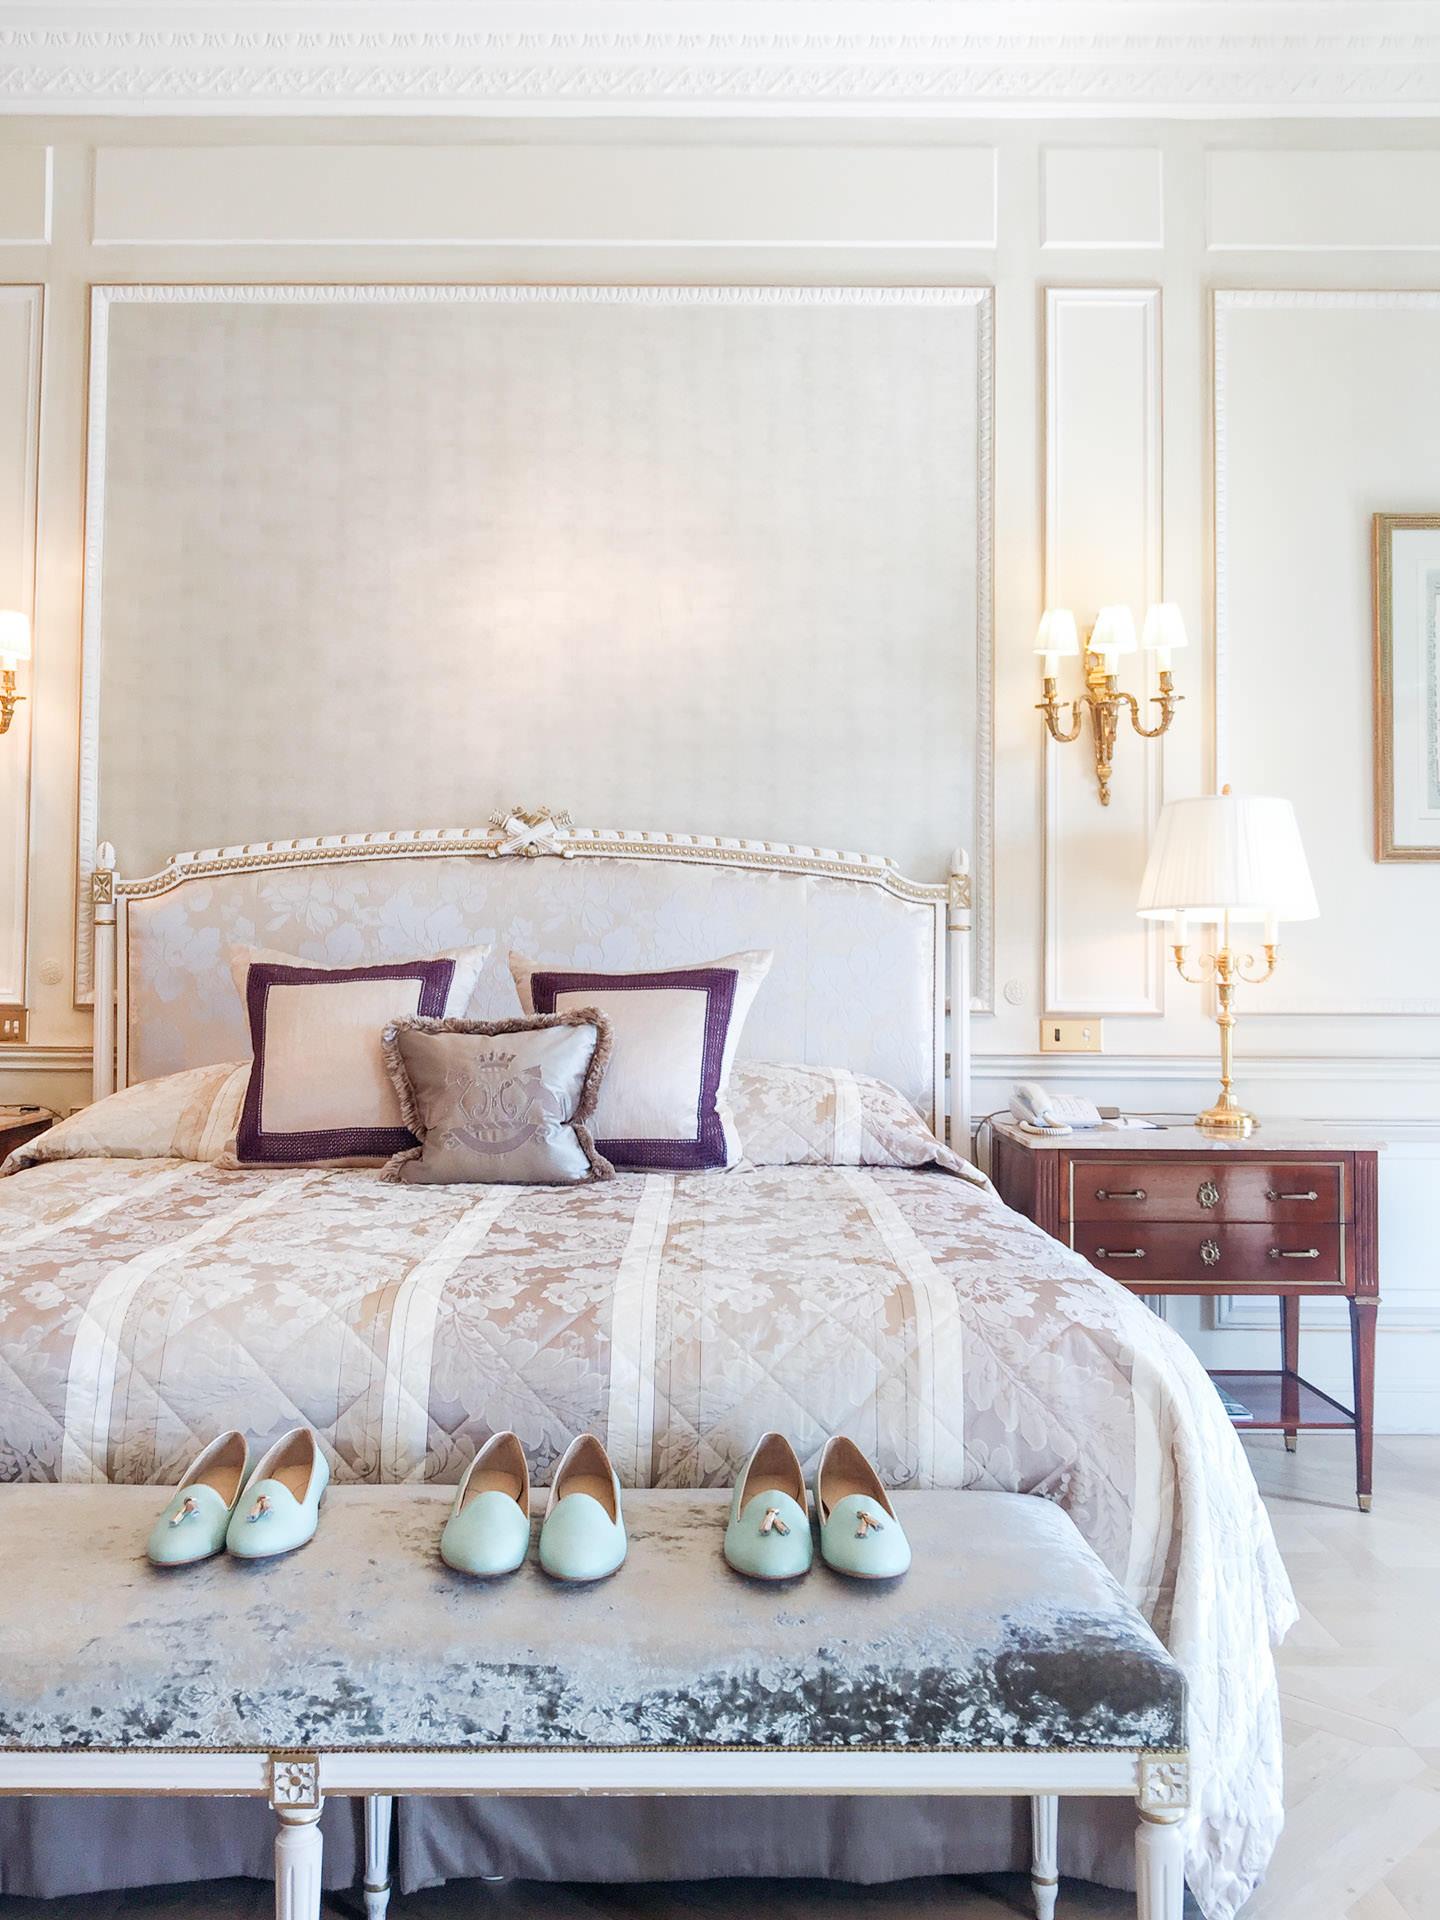 Blog-Mode-And-The-City-Lifestyle-Cinq-Petites-Choses-179-Chatelles-Le-Meurice